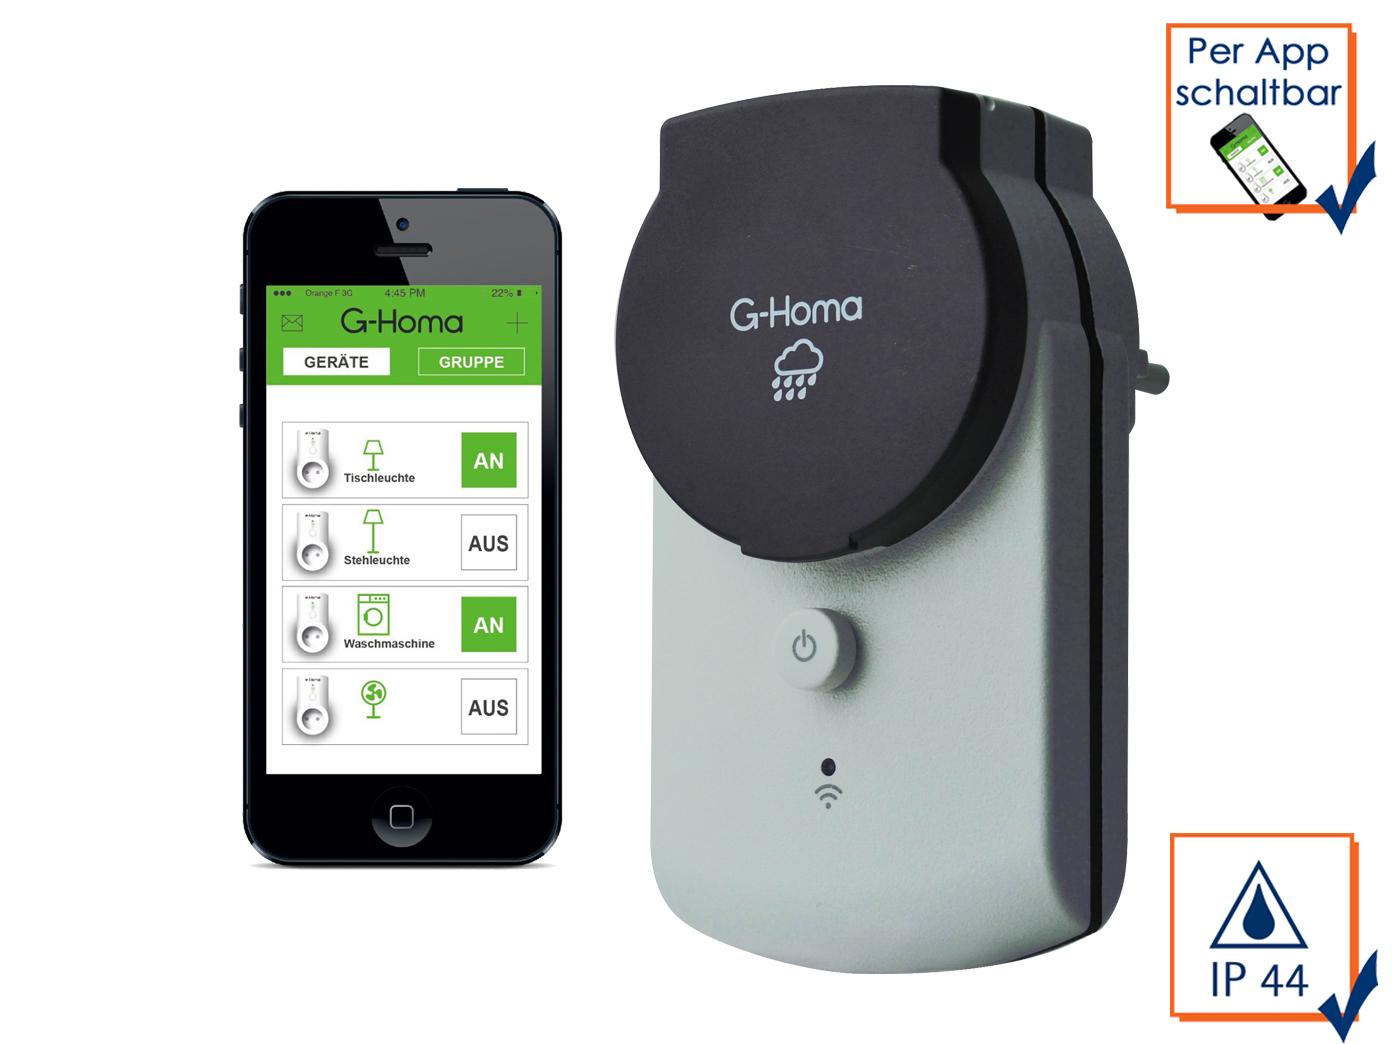 Details zu G Homa WiFi Outdoor Schaltsteckdose, schalten per APP Funksteckdose WLAN Stecker